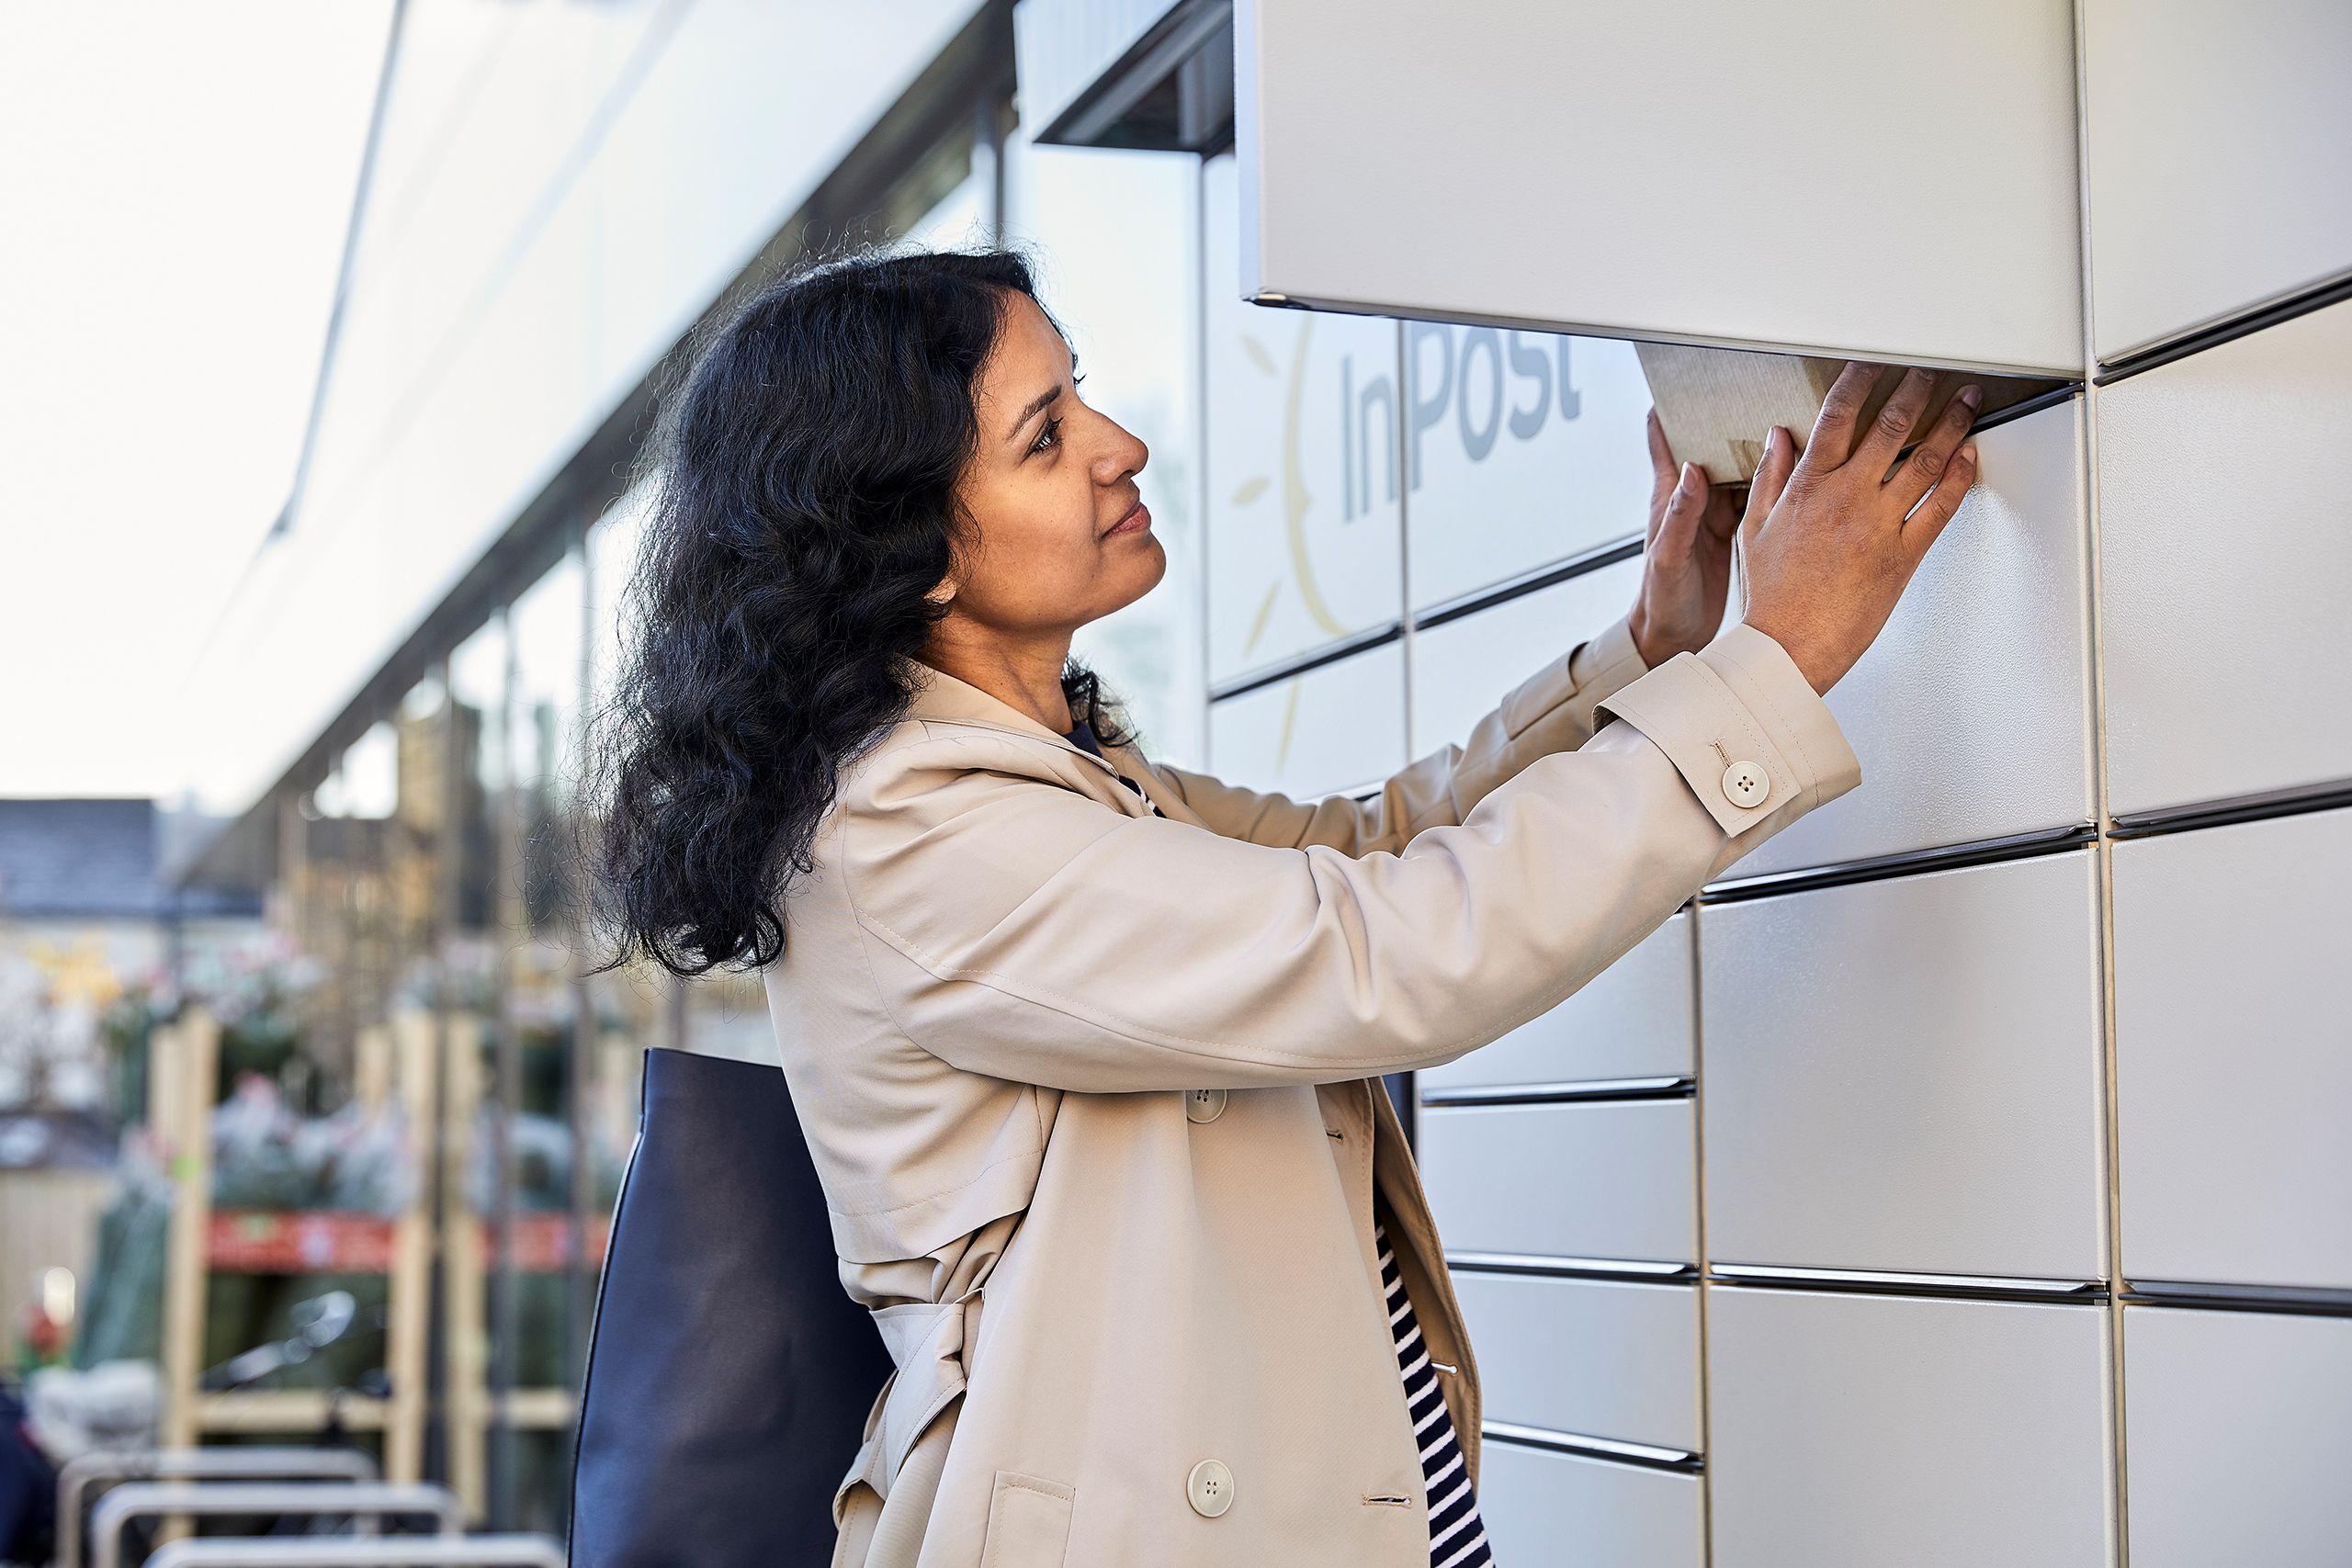 Woman at Lidl locker.jpg